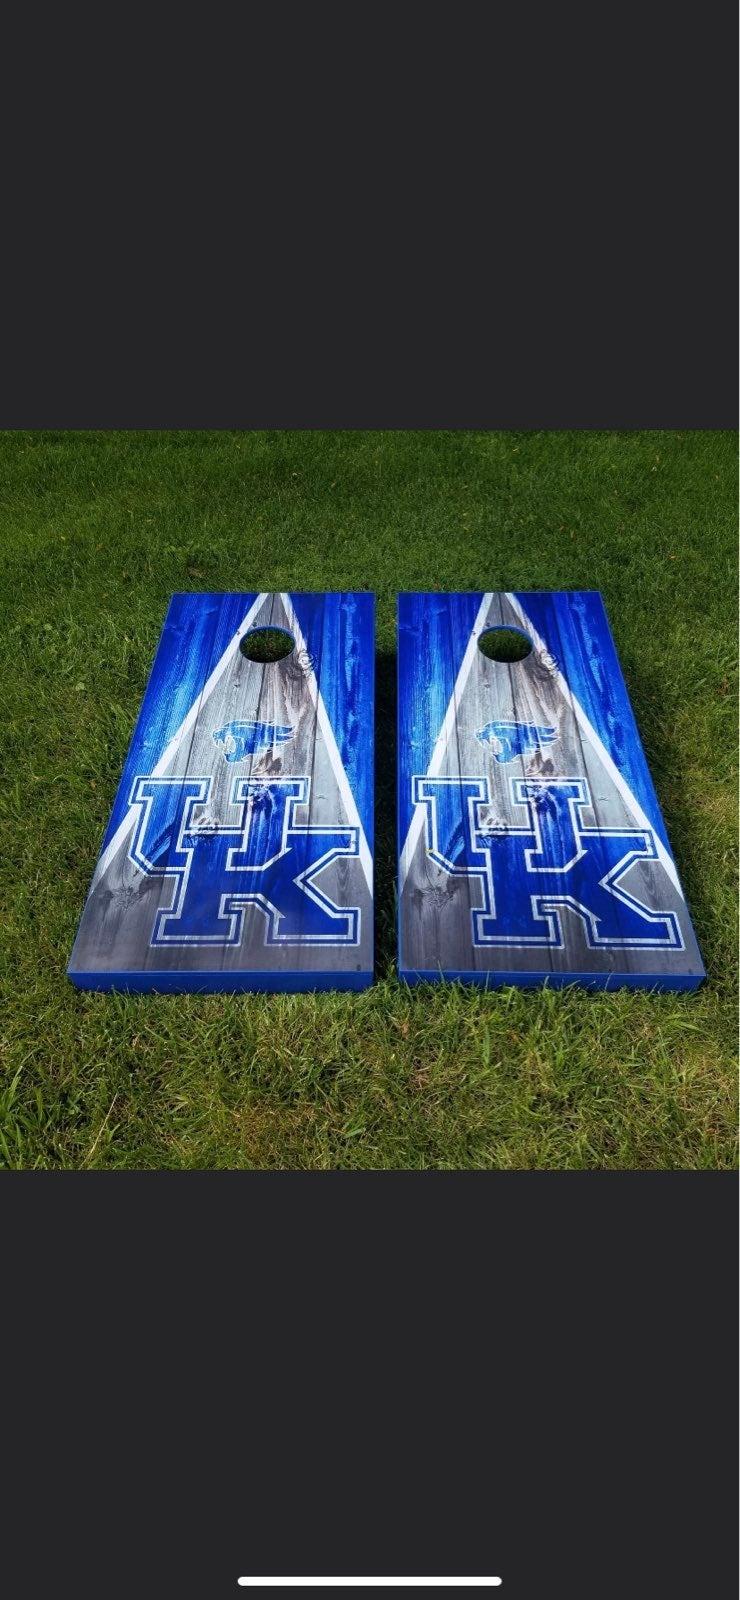 Hand made cornhole boards